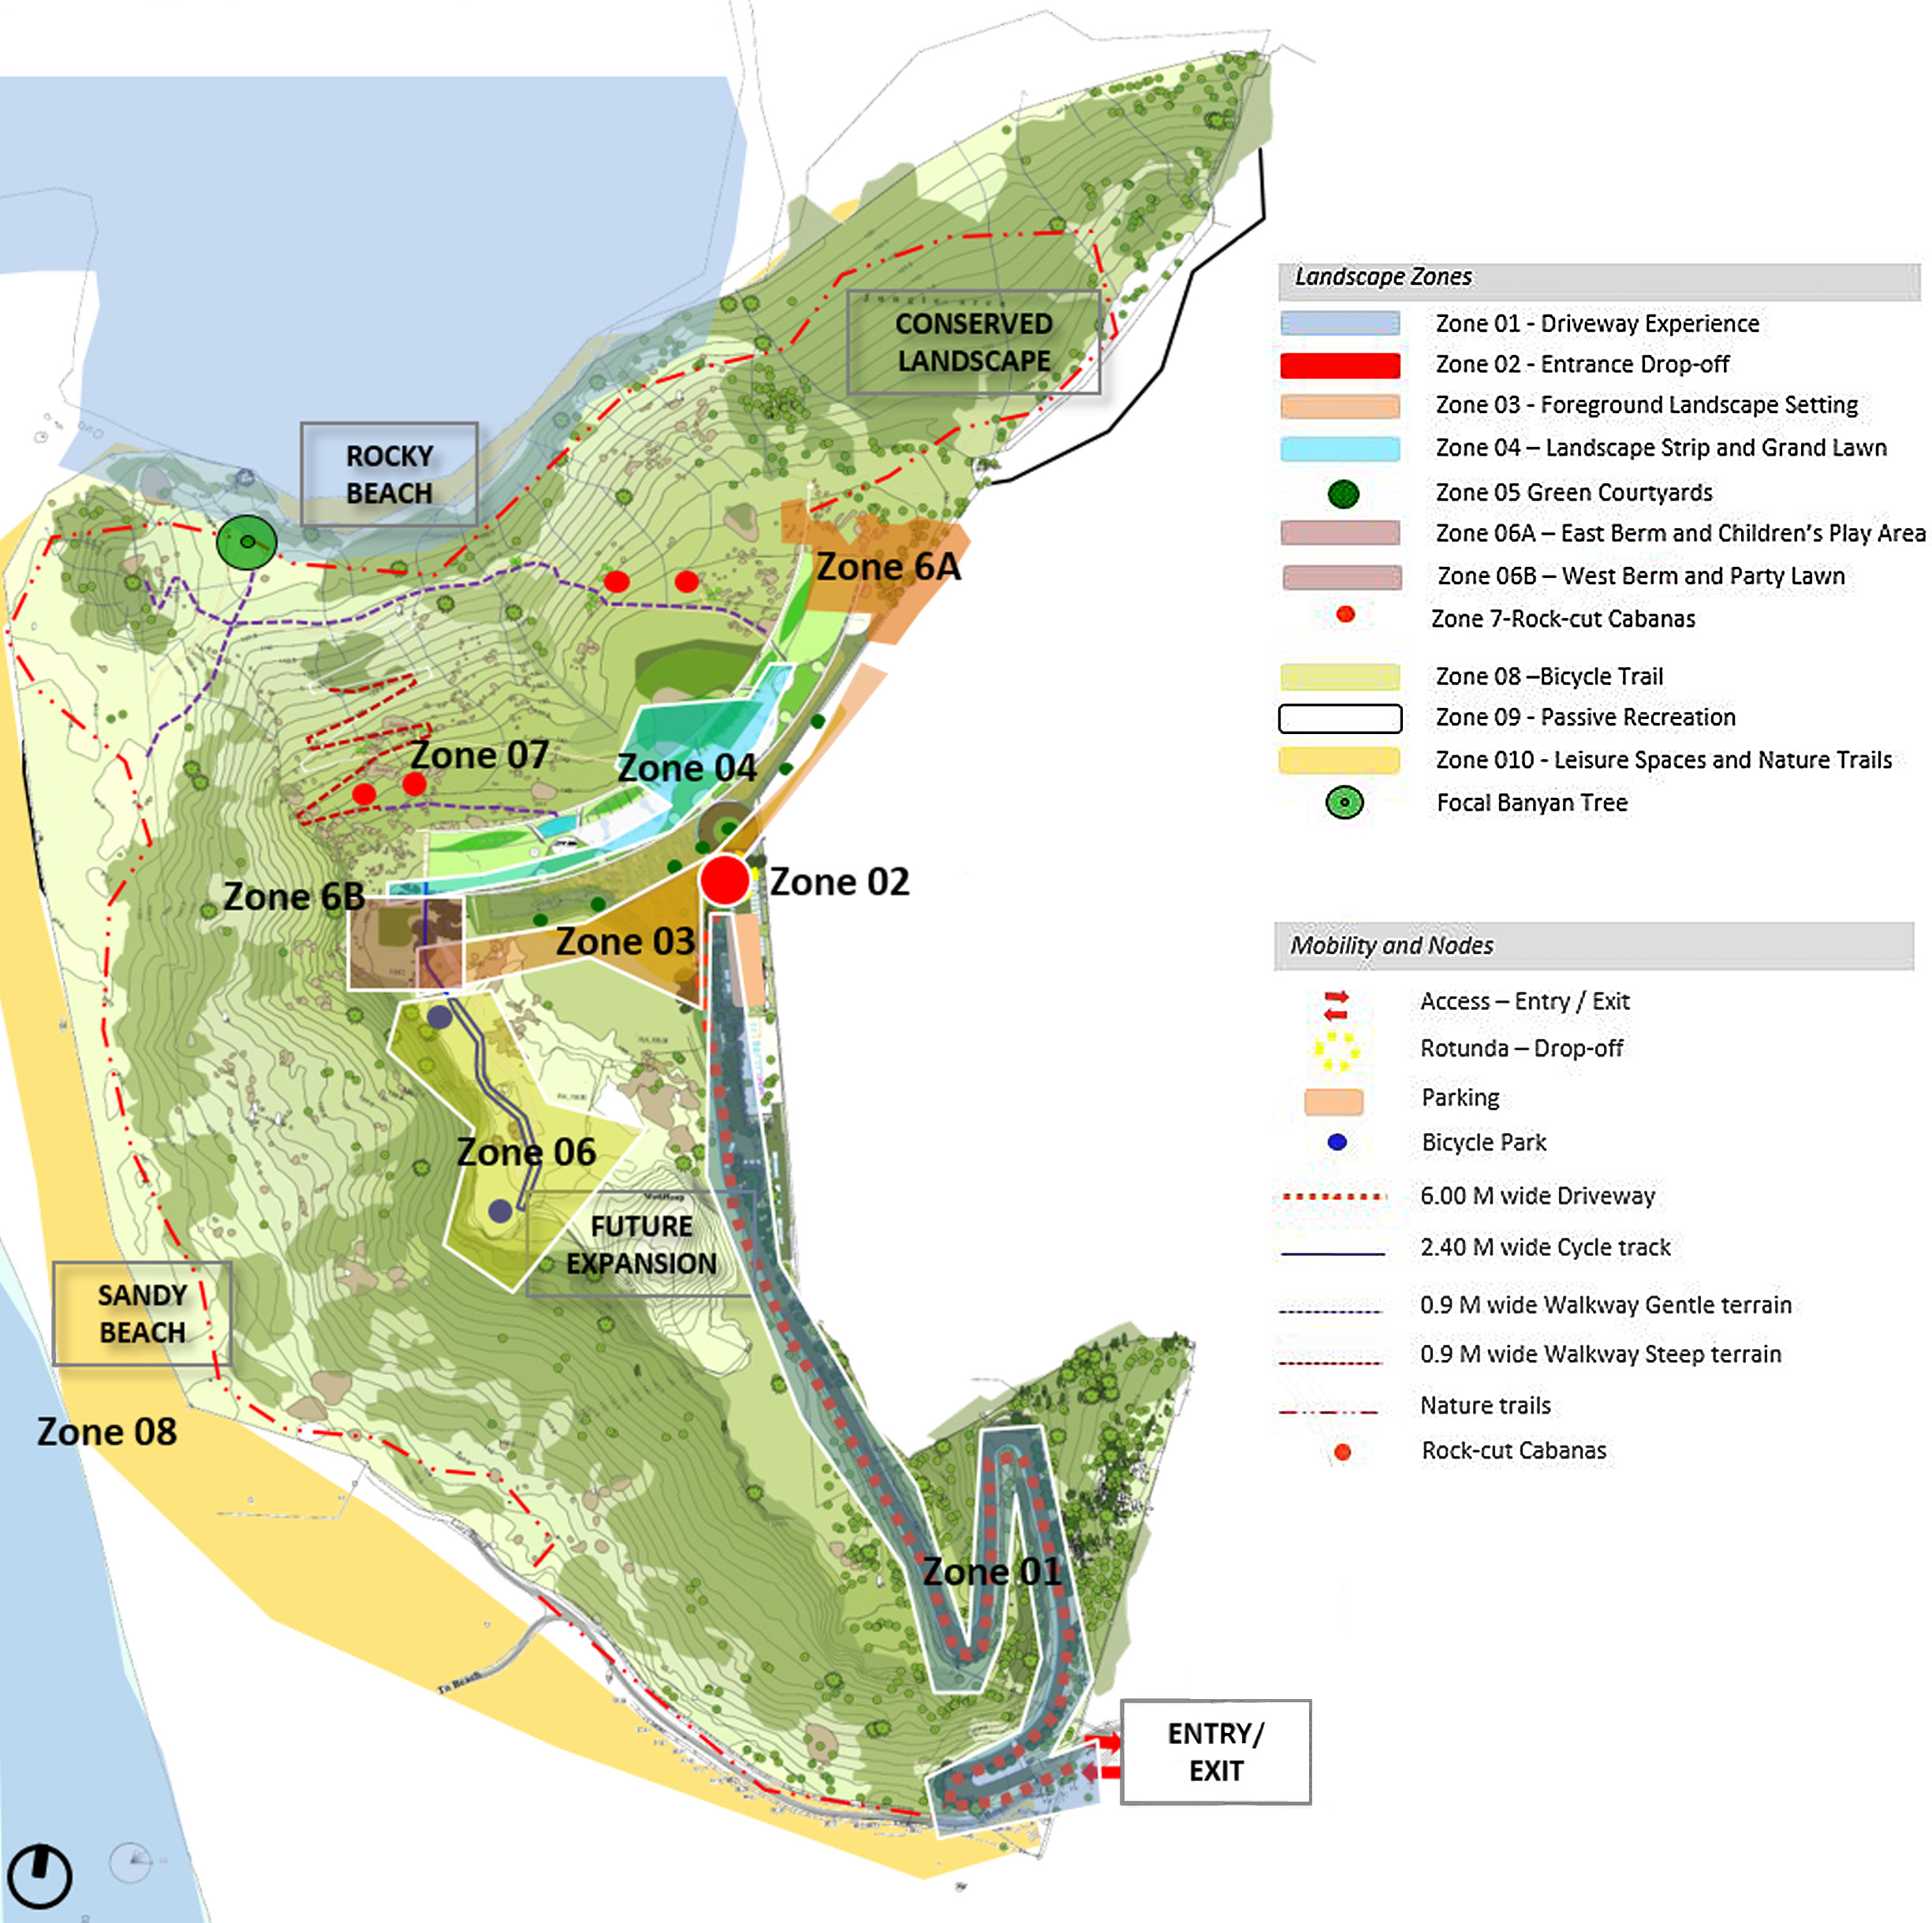 Ficus-landscape-bangalore-nature trail-maharashtra-resort-ecological-plan-render